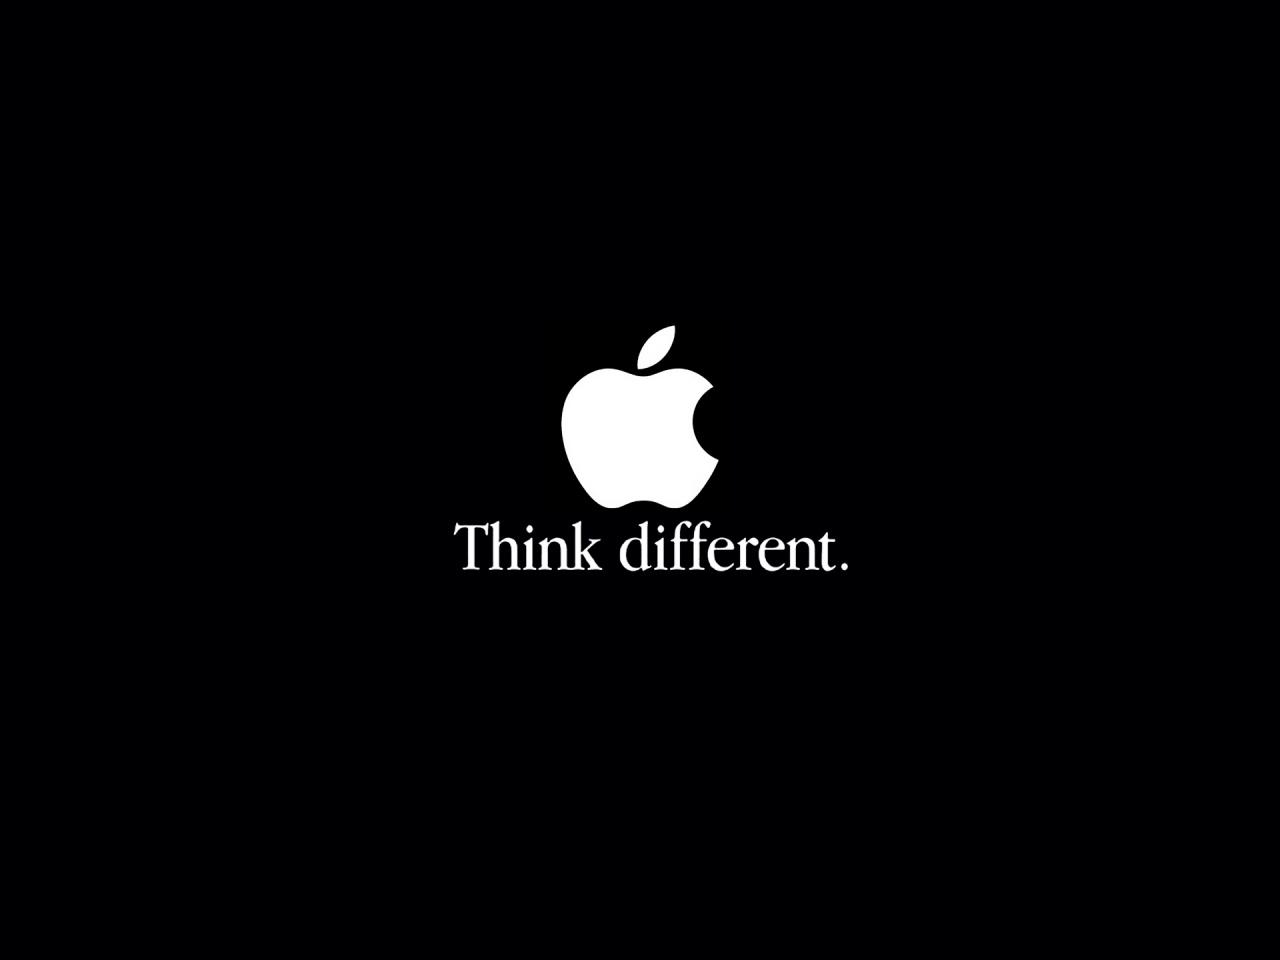 apple-slogan.jpg